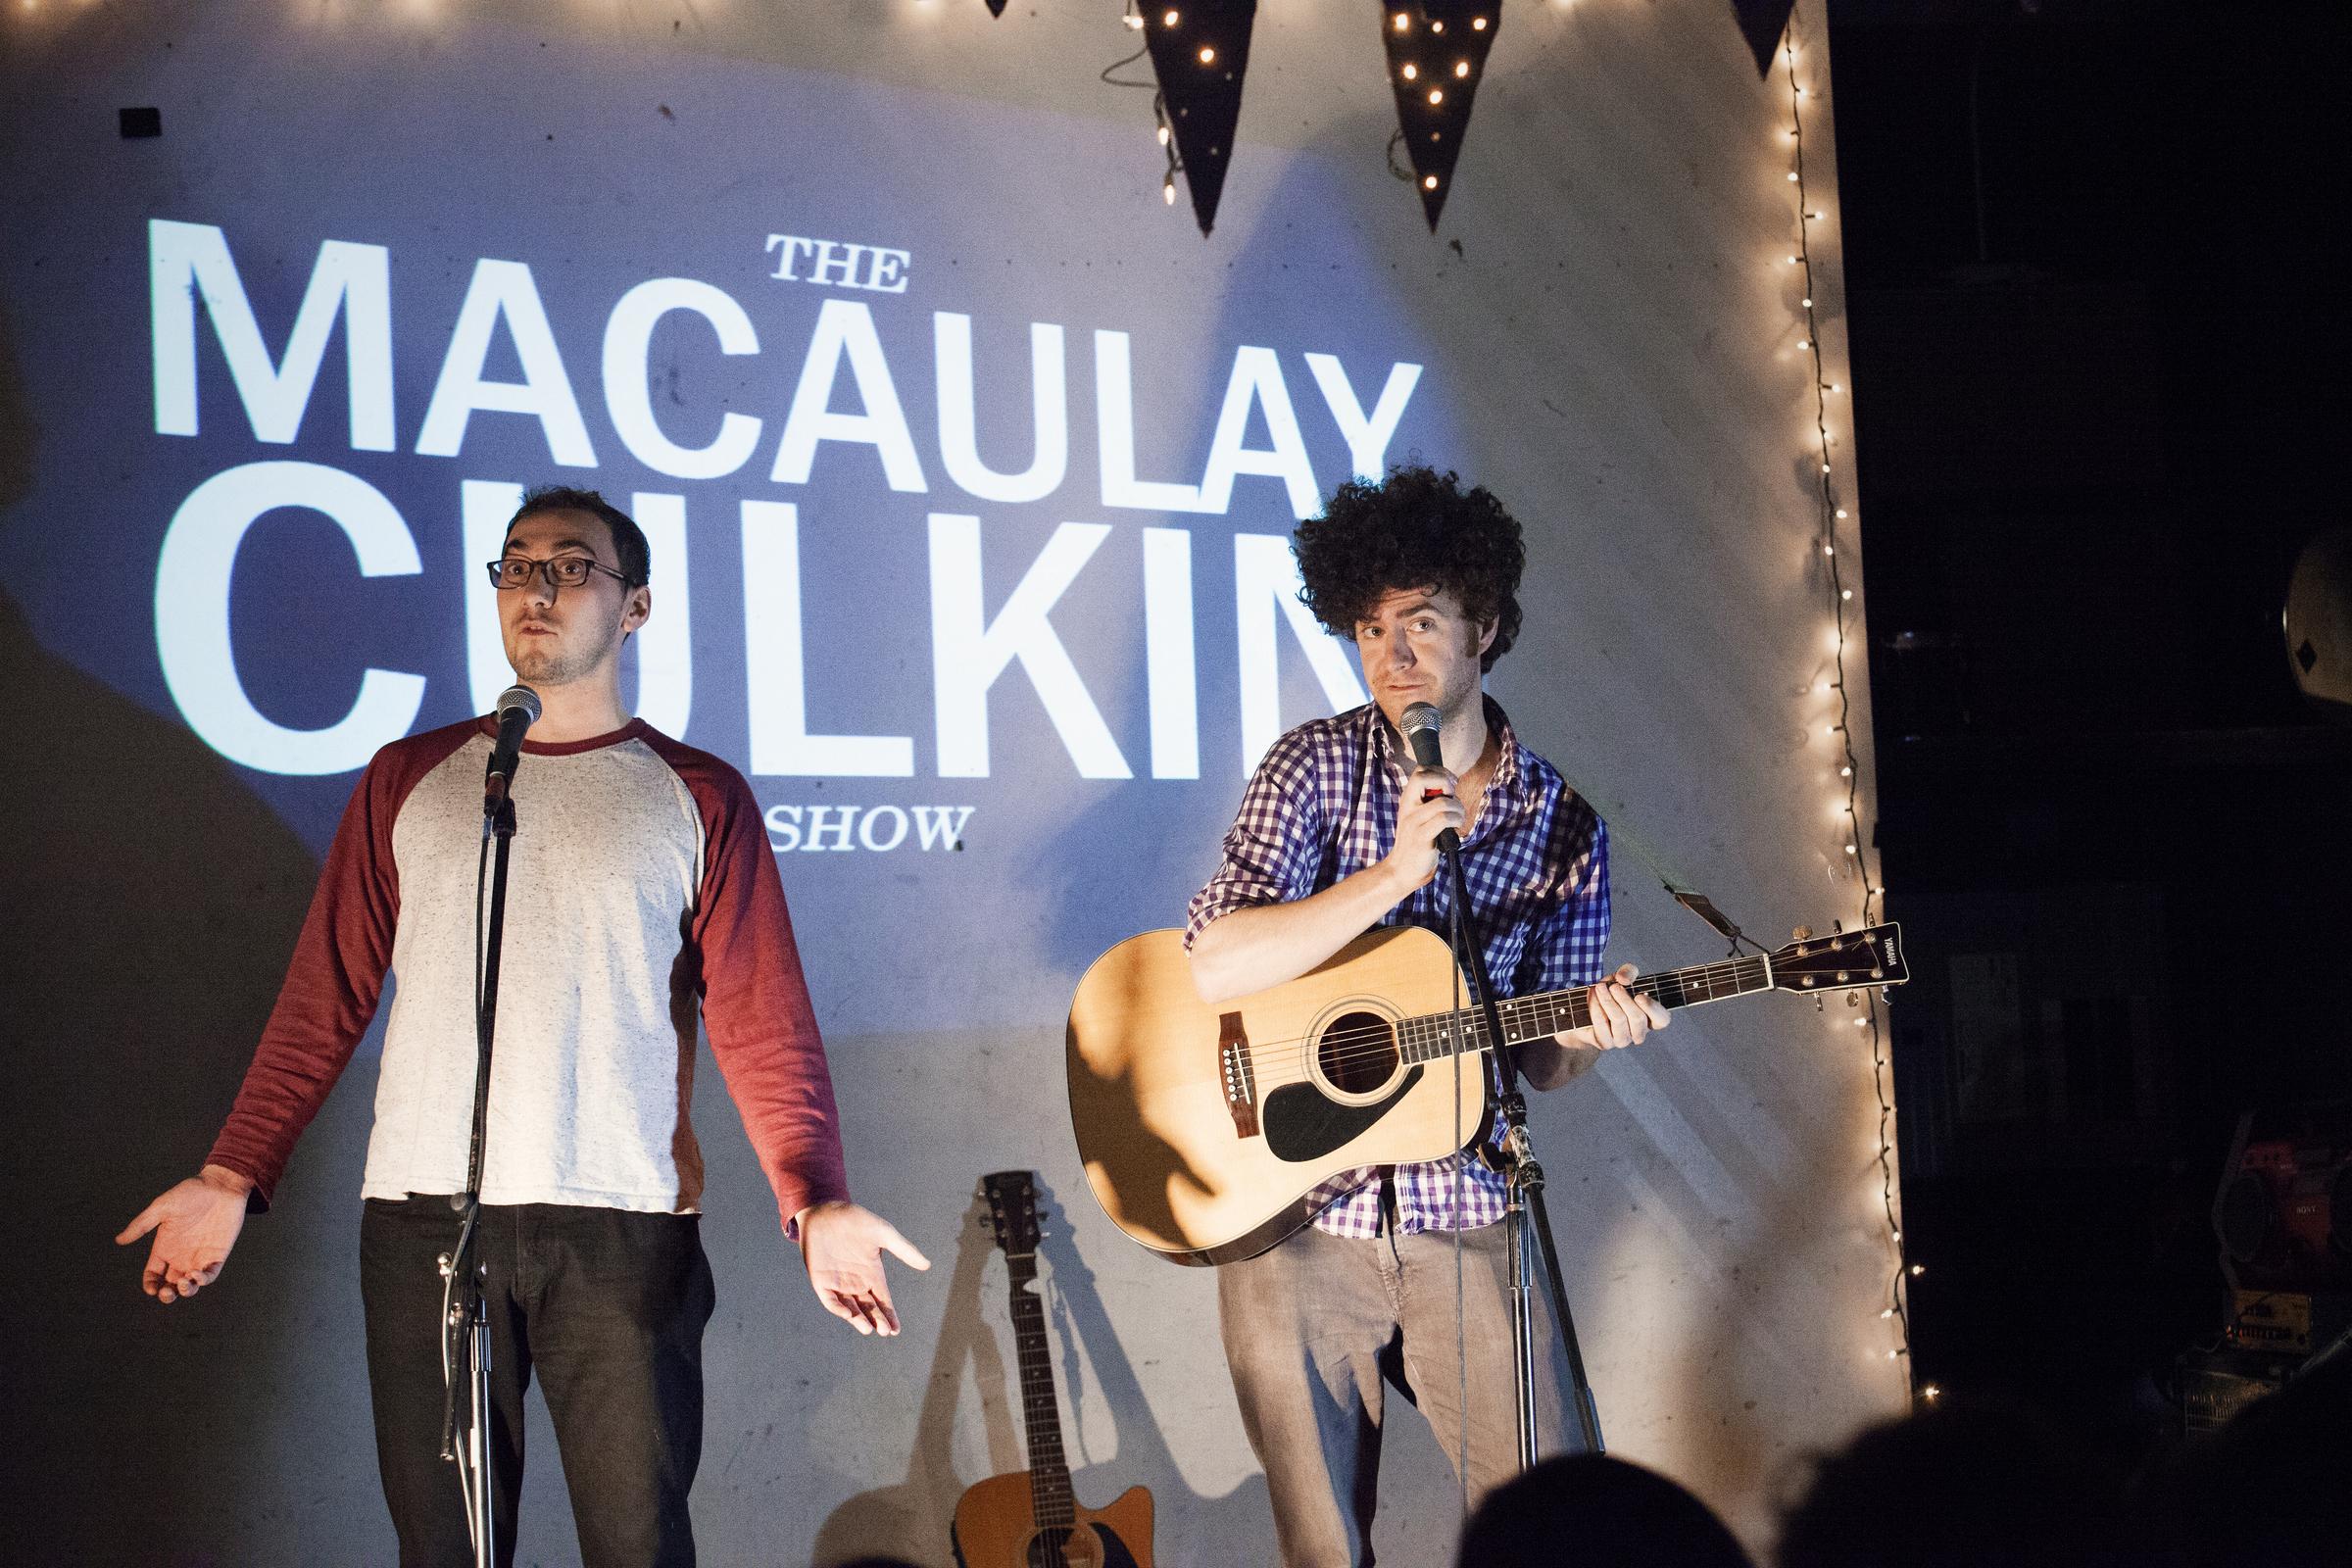 macauley-culkin-comedy-4979.jpg